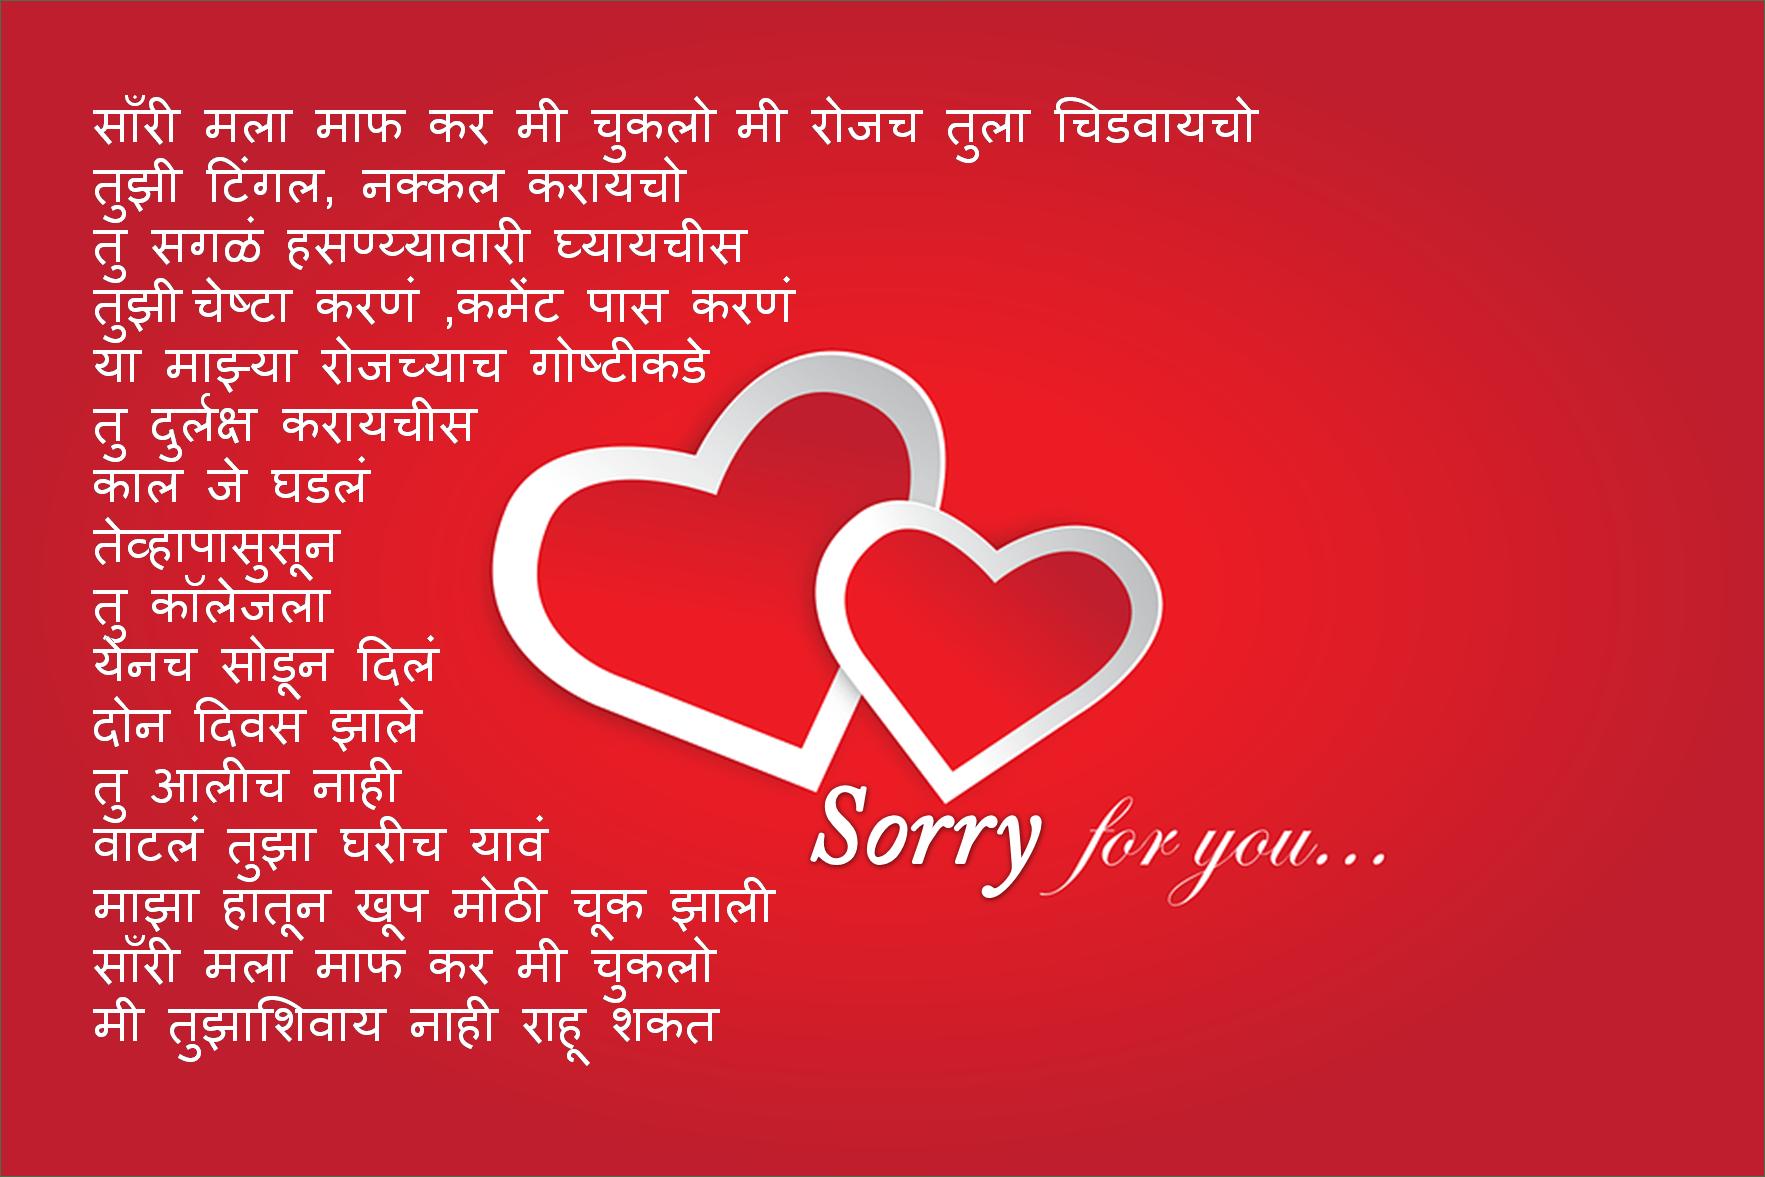 Marathi sorry kavita